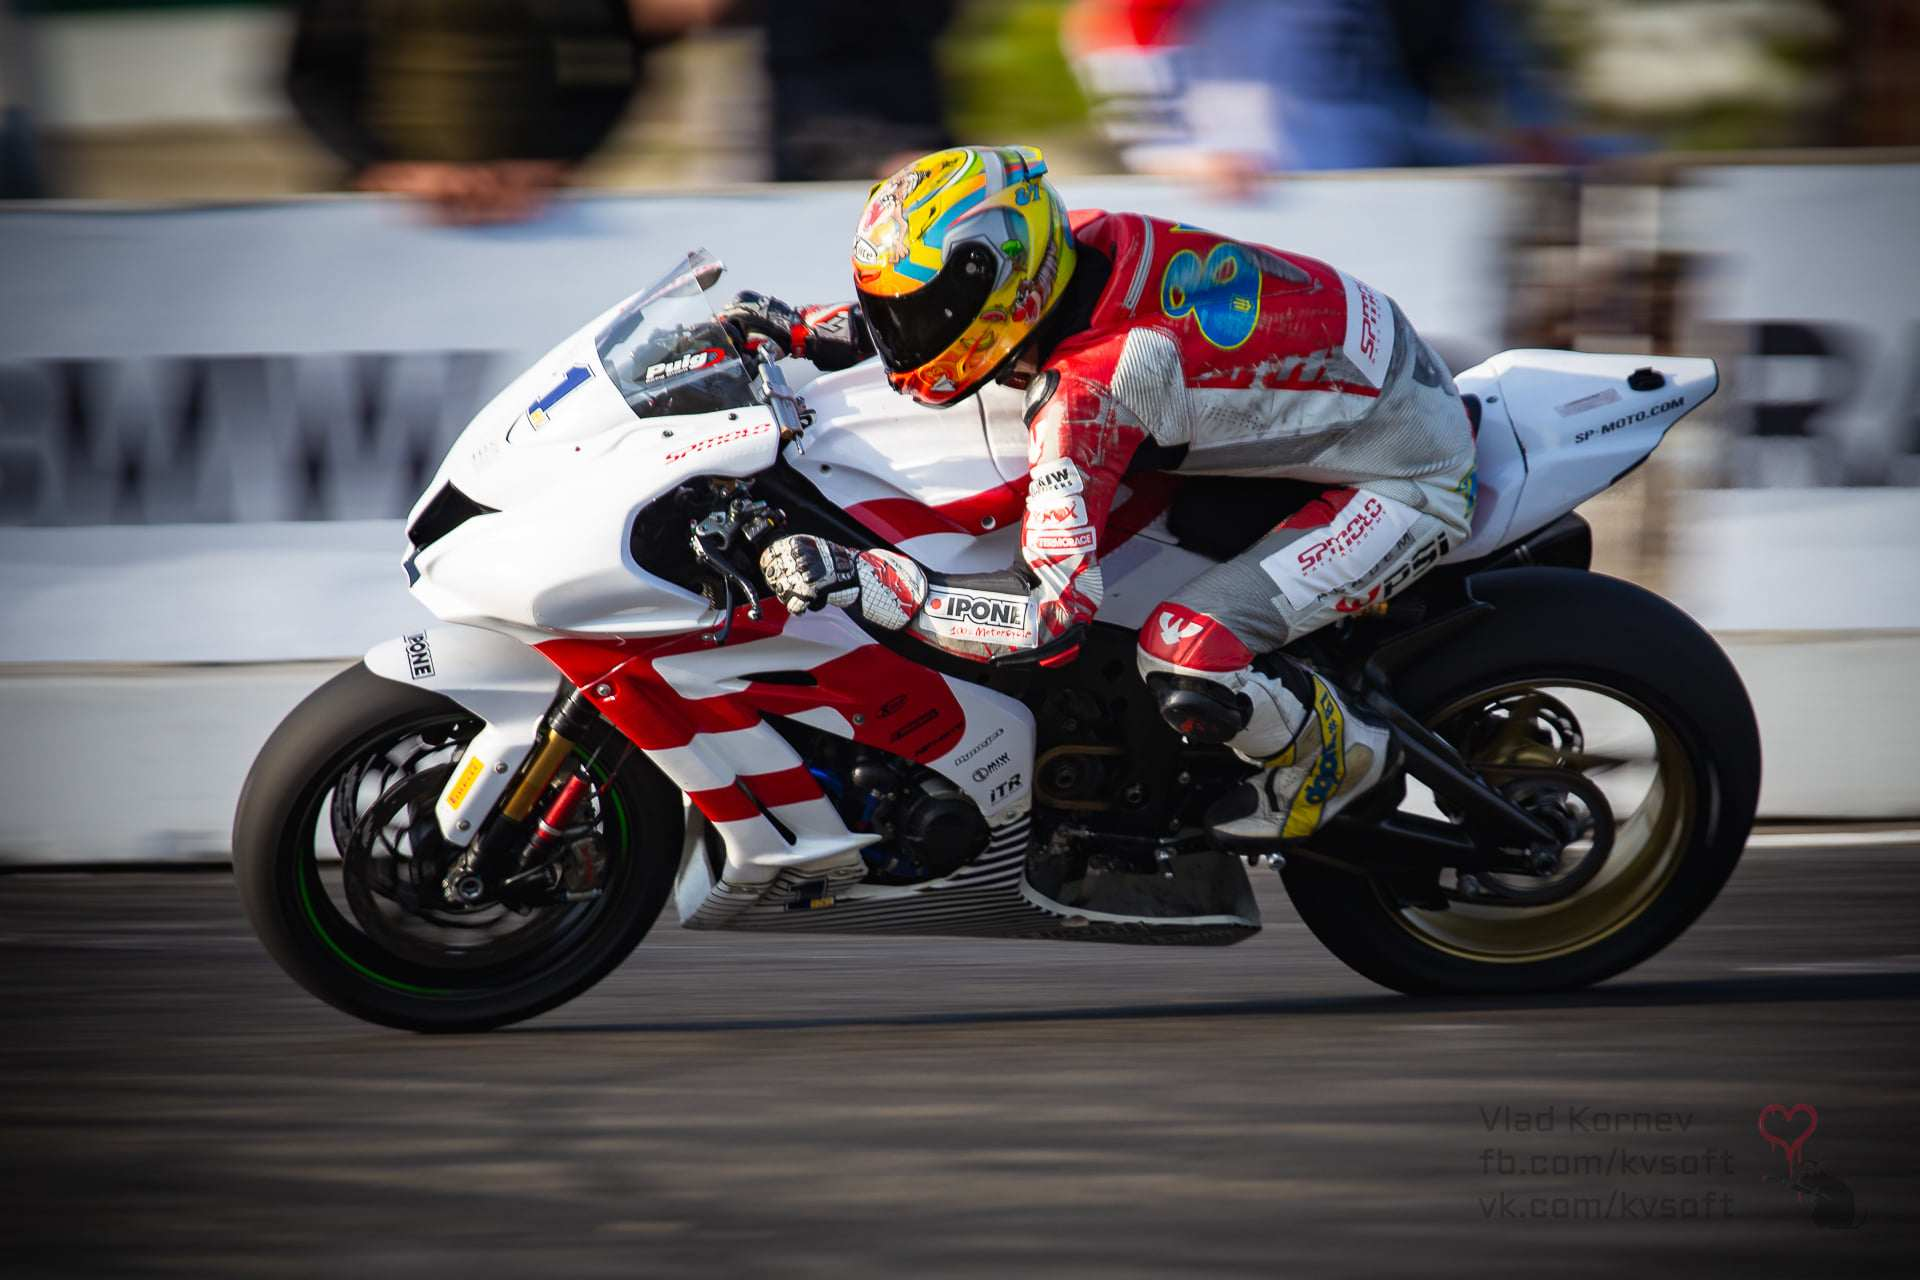 5-6_etap_MotoGPUkraine_136